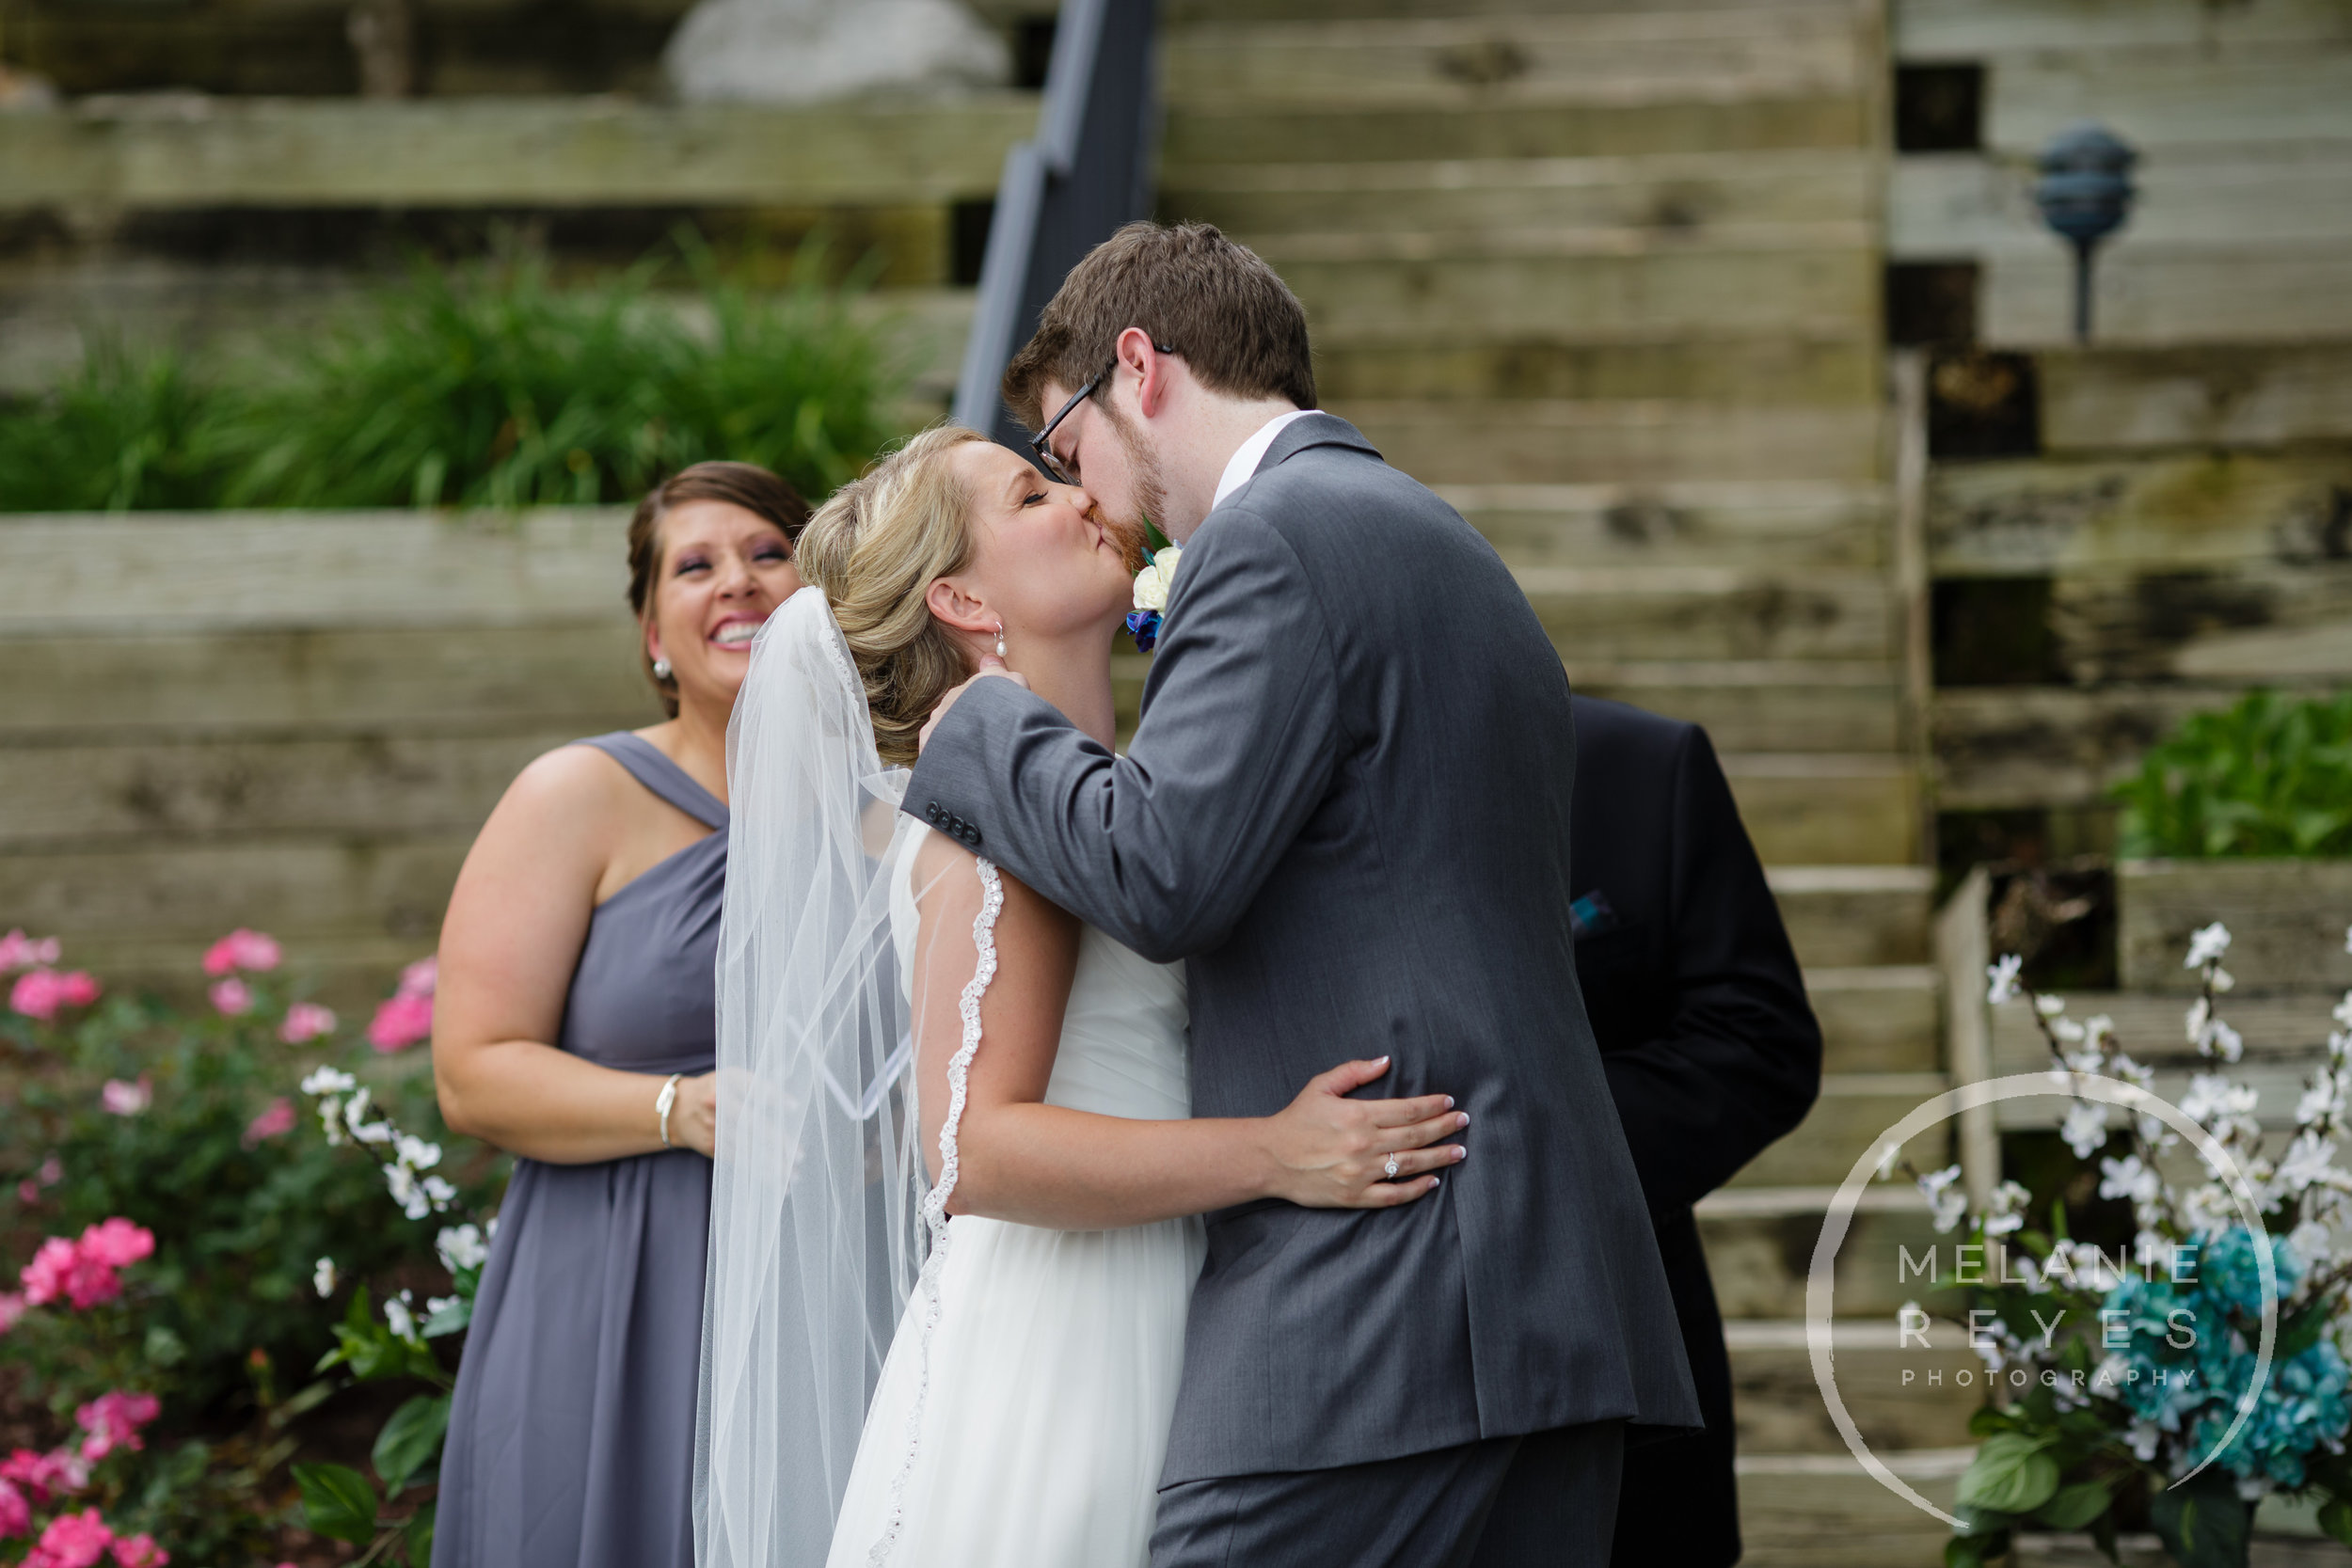 031_grandrapids_wedding_photographer_melaniereyes.JPG